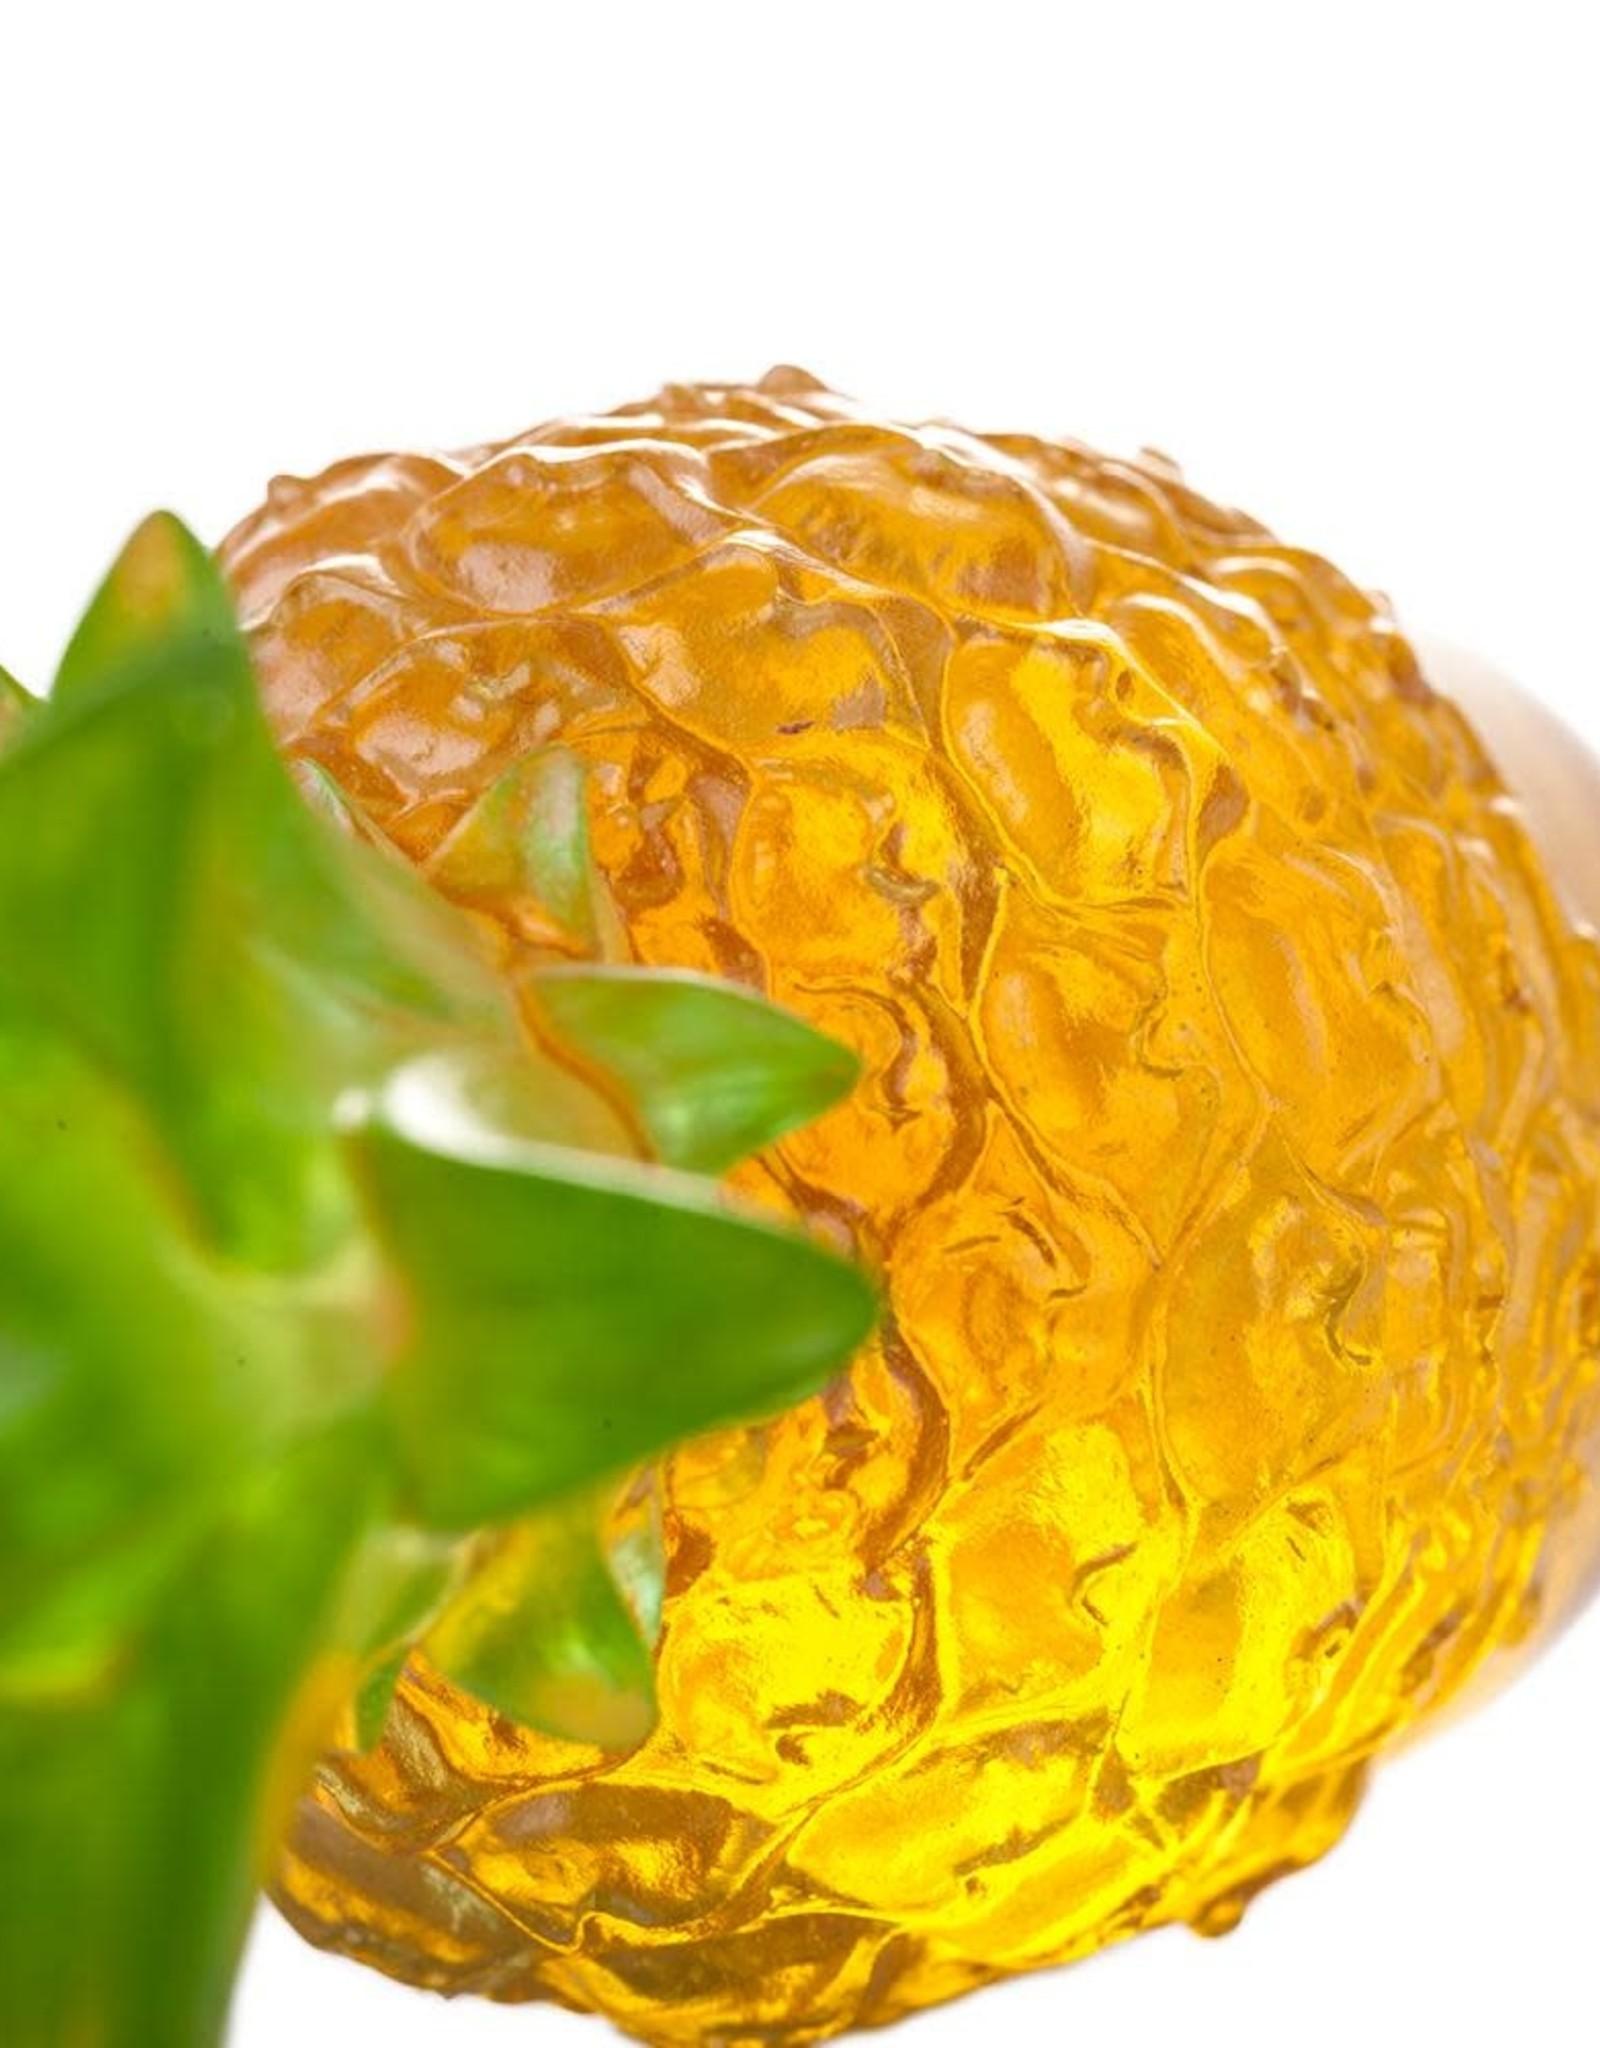 LIULI Crystal Art Crystal Pineapple (Limited Edition)